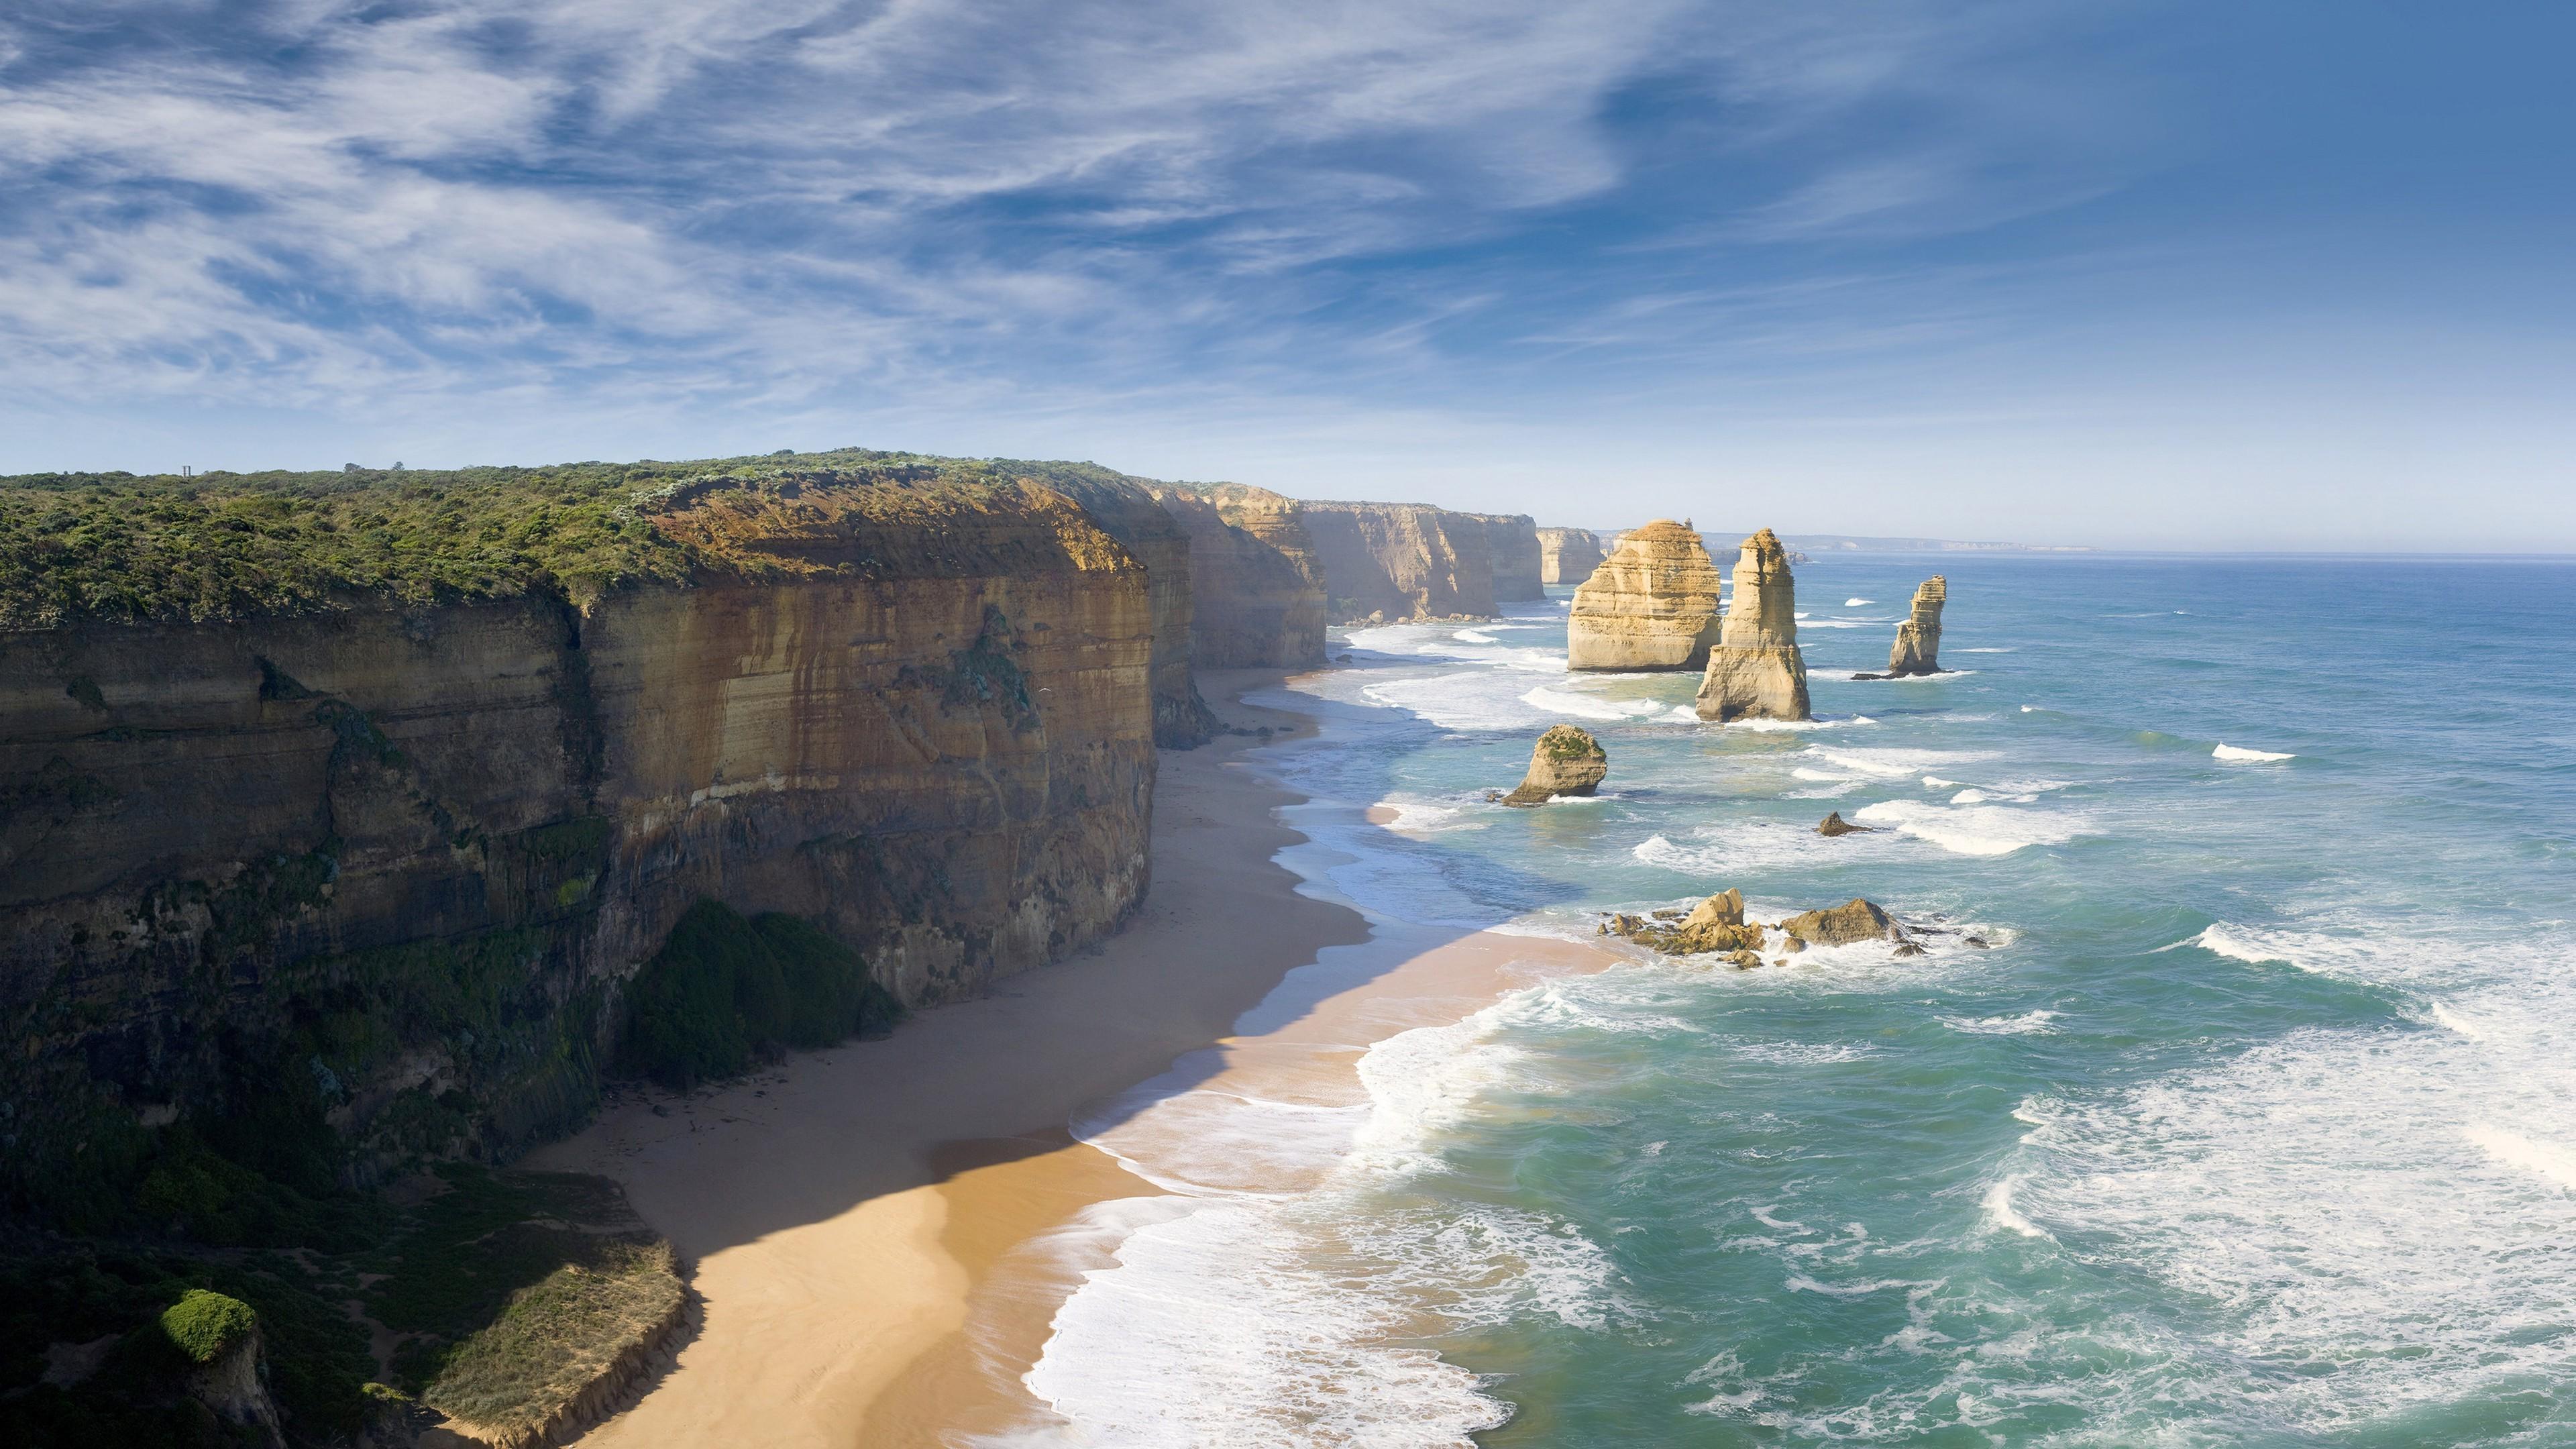 wallpaper : 3840x2160 px, australia, beach, cliff, coast, great